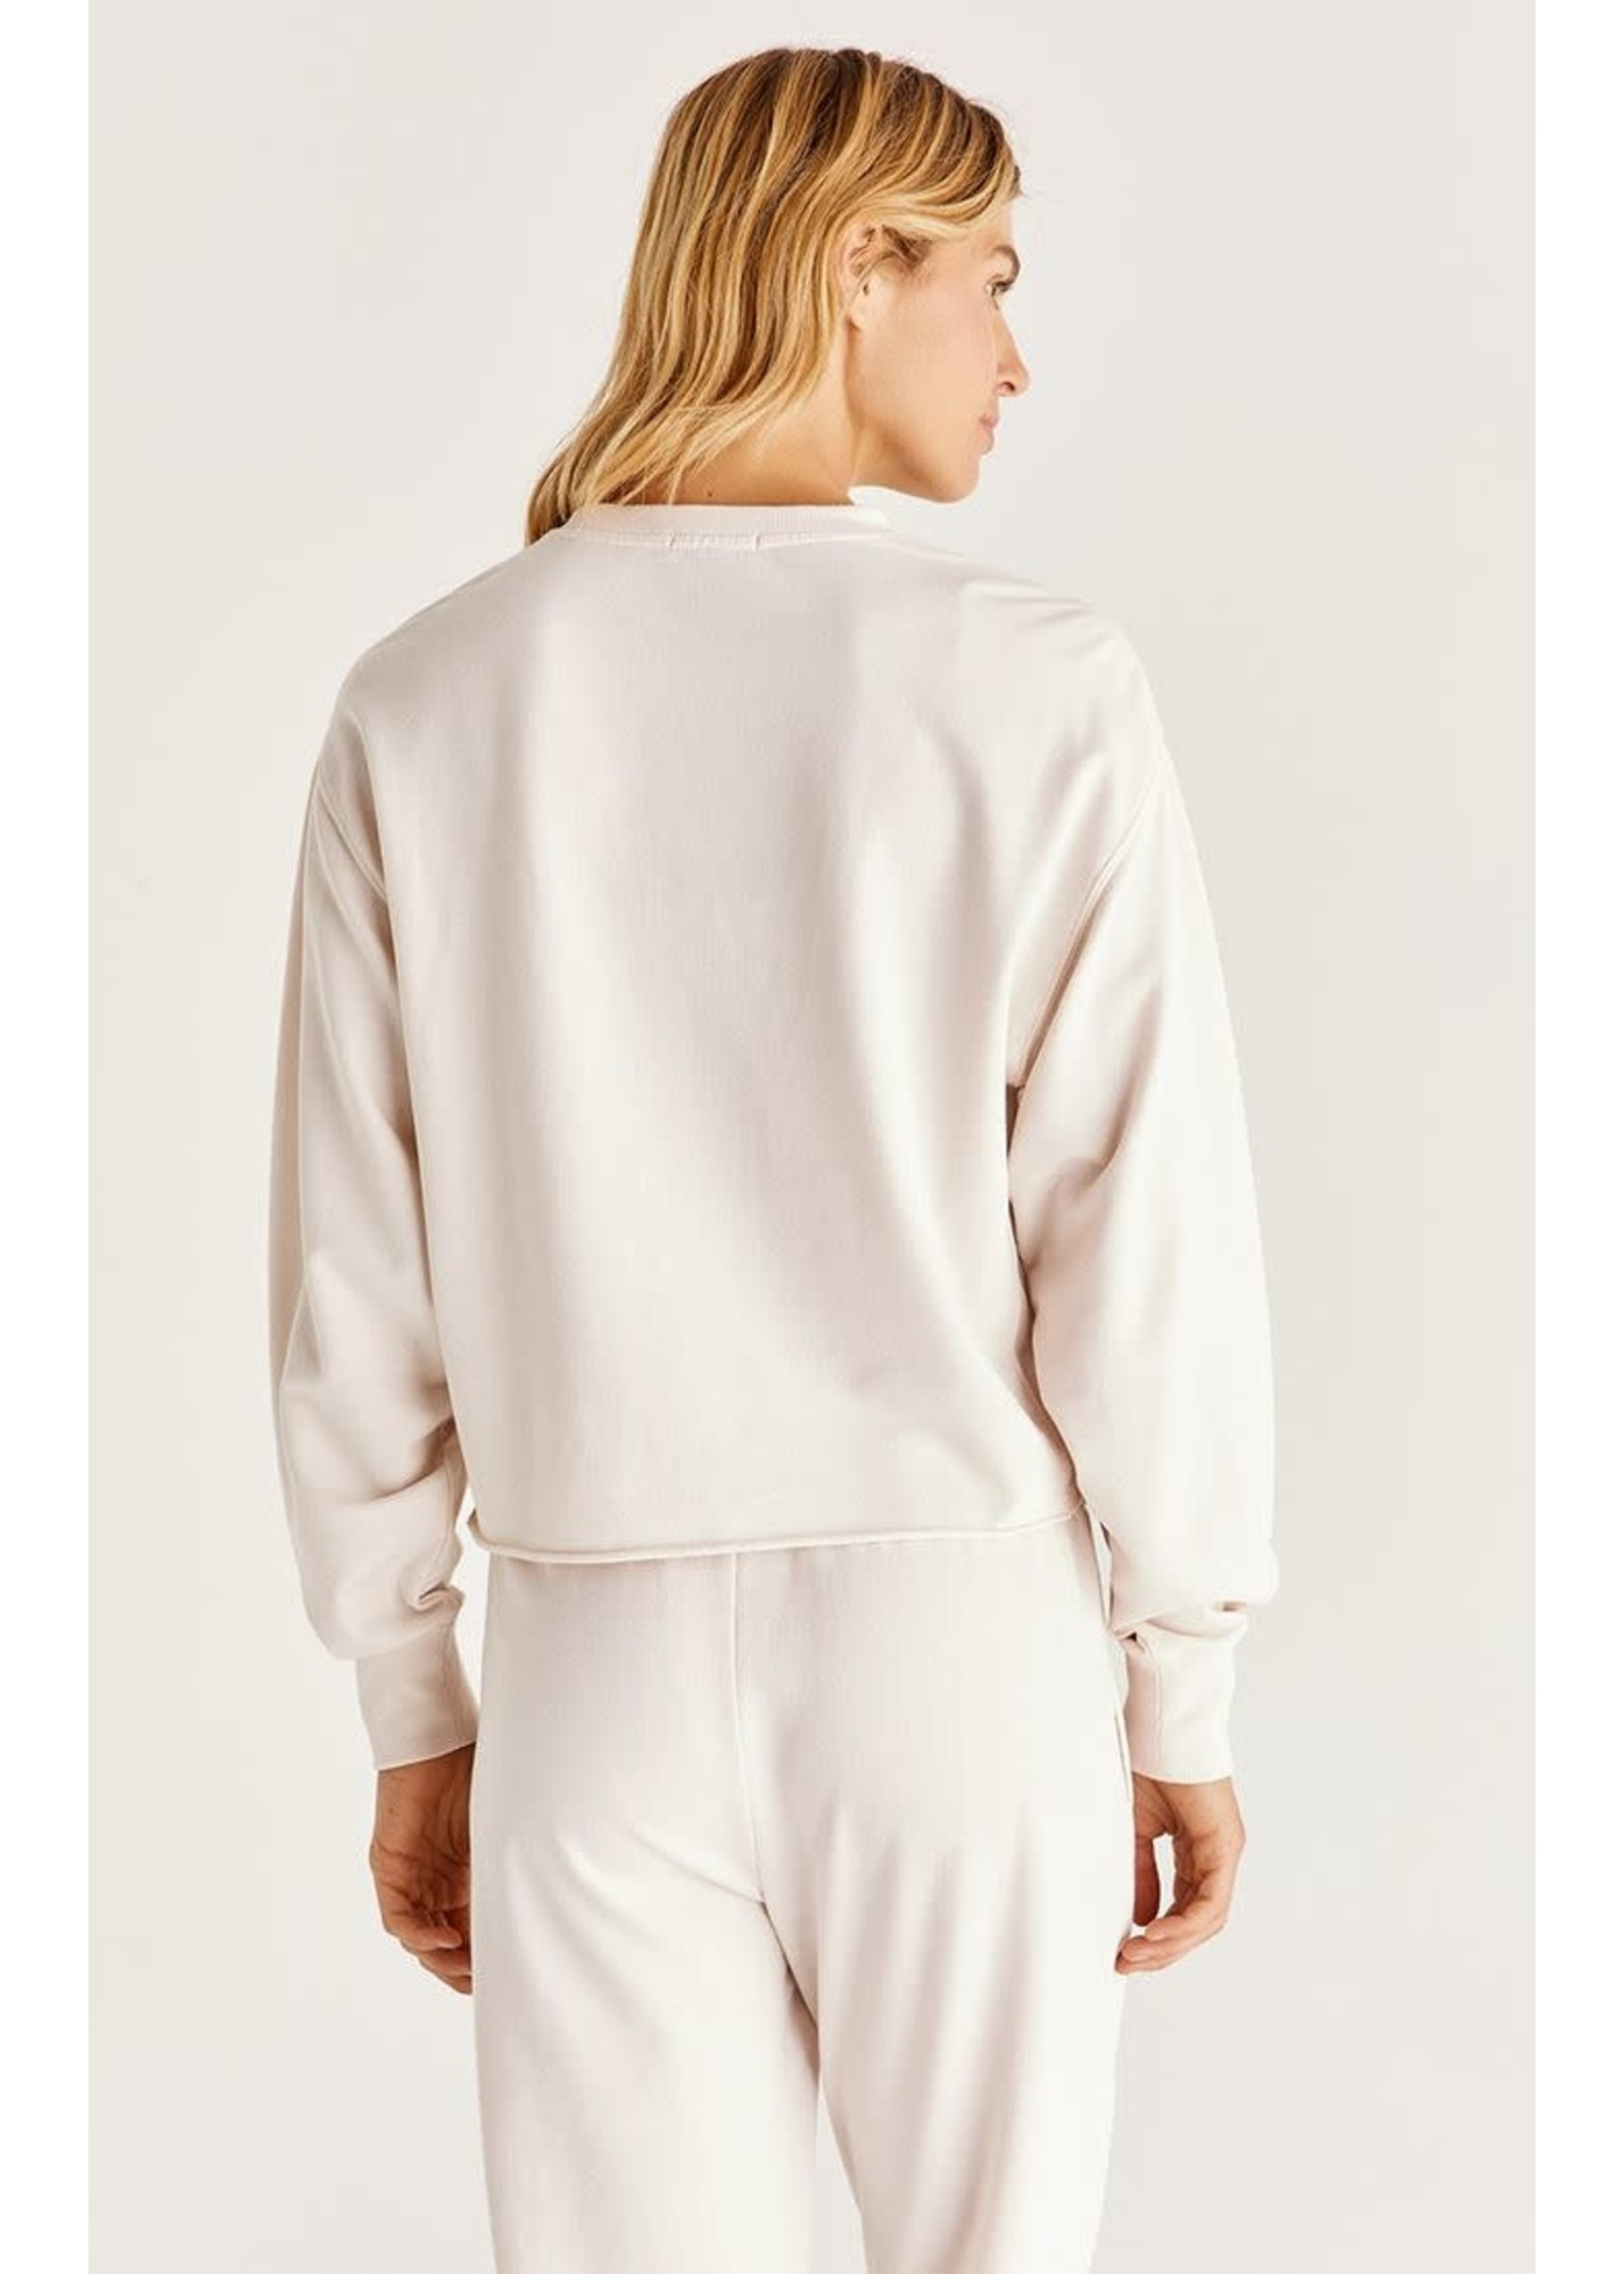 Z Supply Claire Boxy Sweatshirt - ZT213283